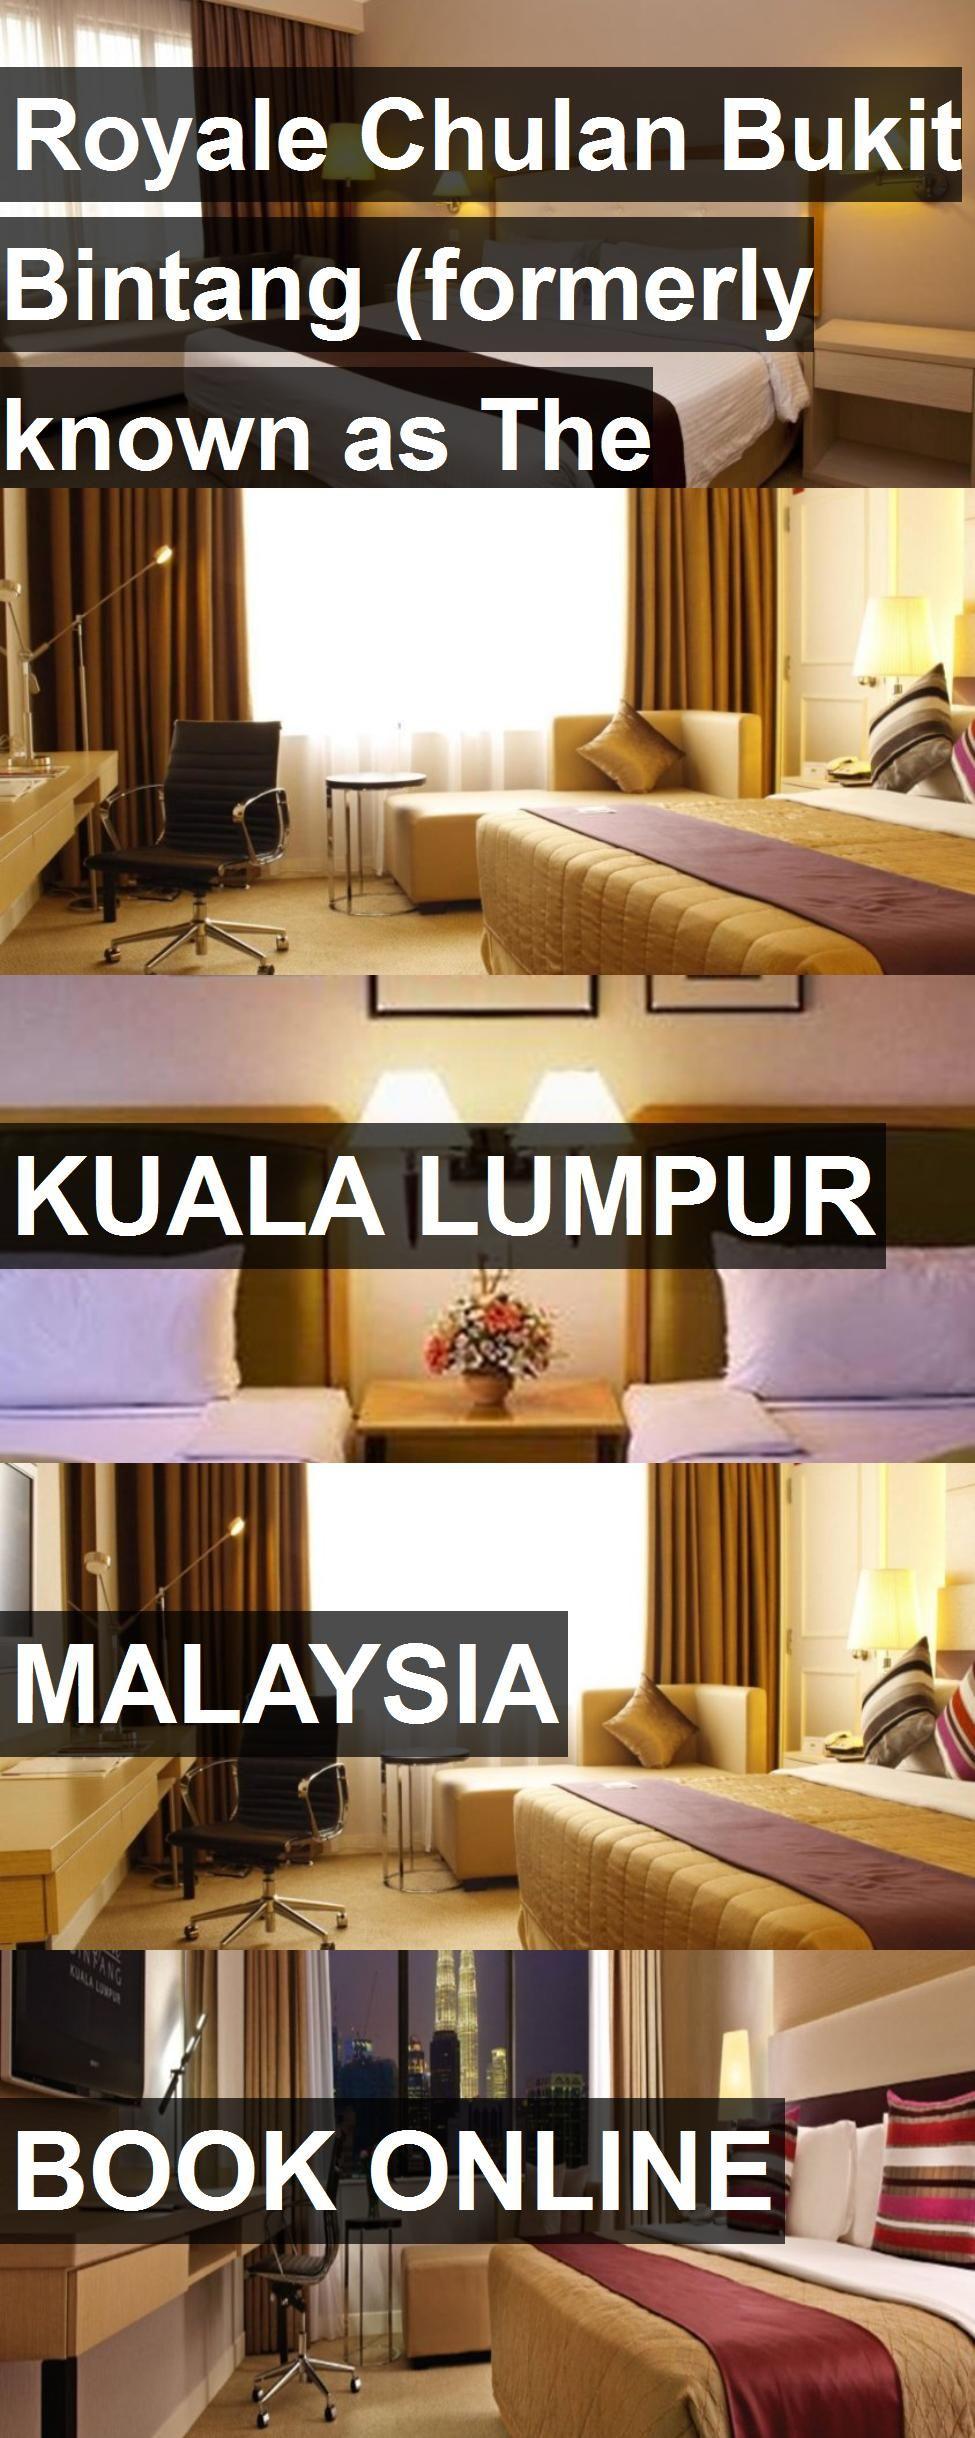 The 25 best Bukit bintang kuala lumpur ideas on Pinterest